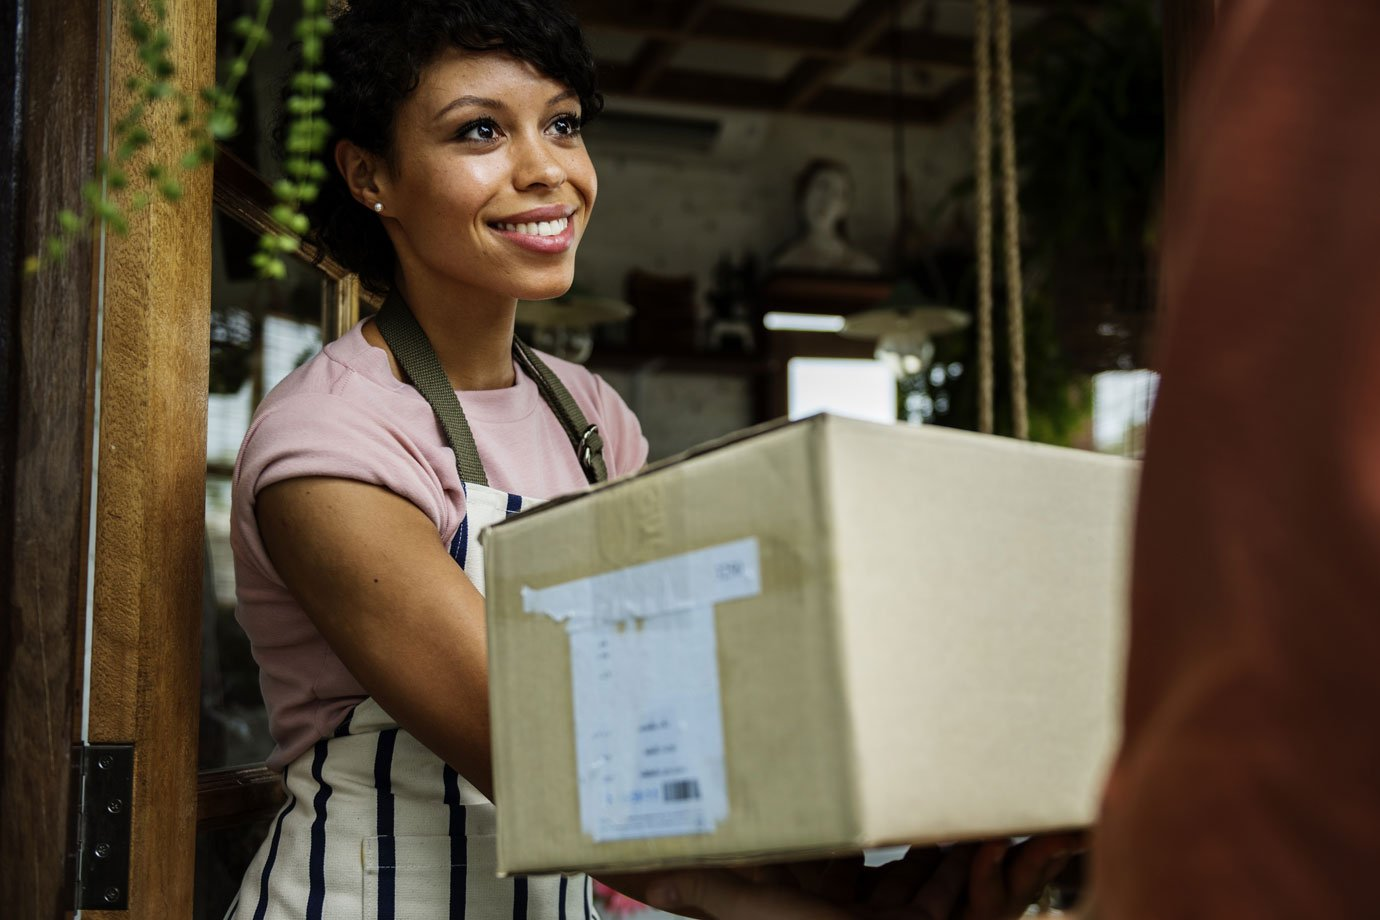 Mulher recebe caixa de entregador de delivery